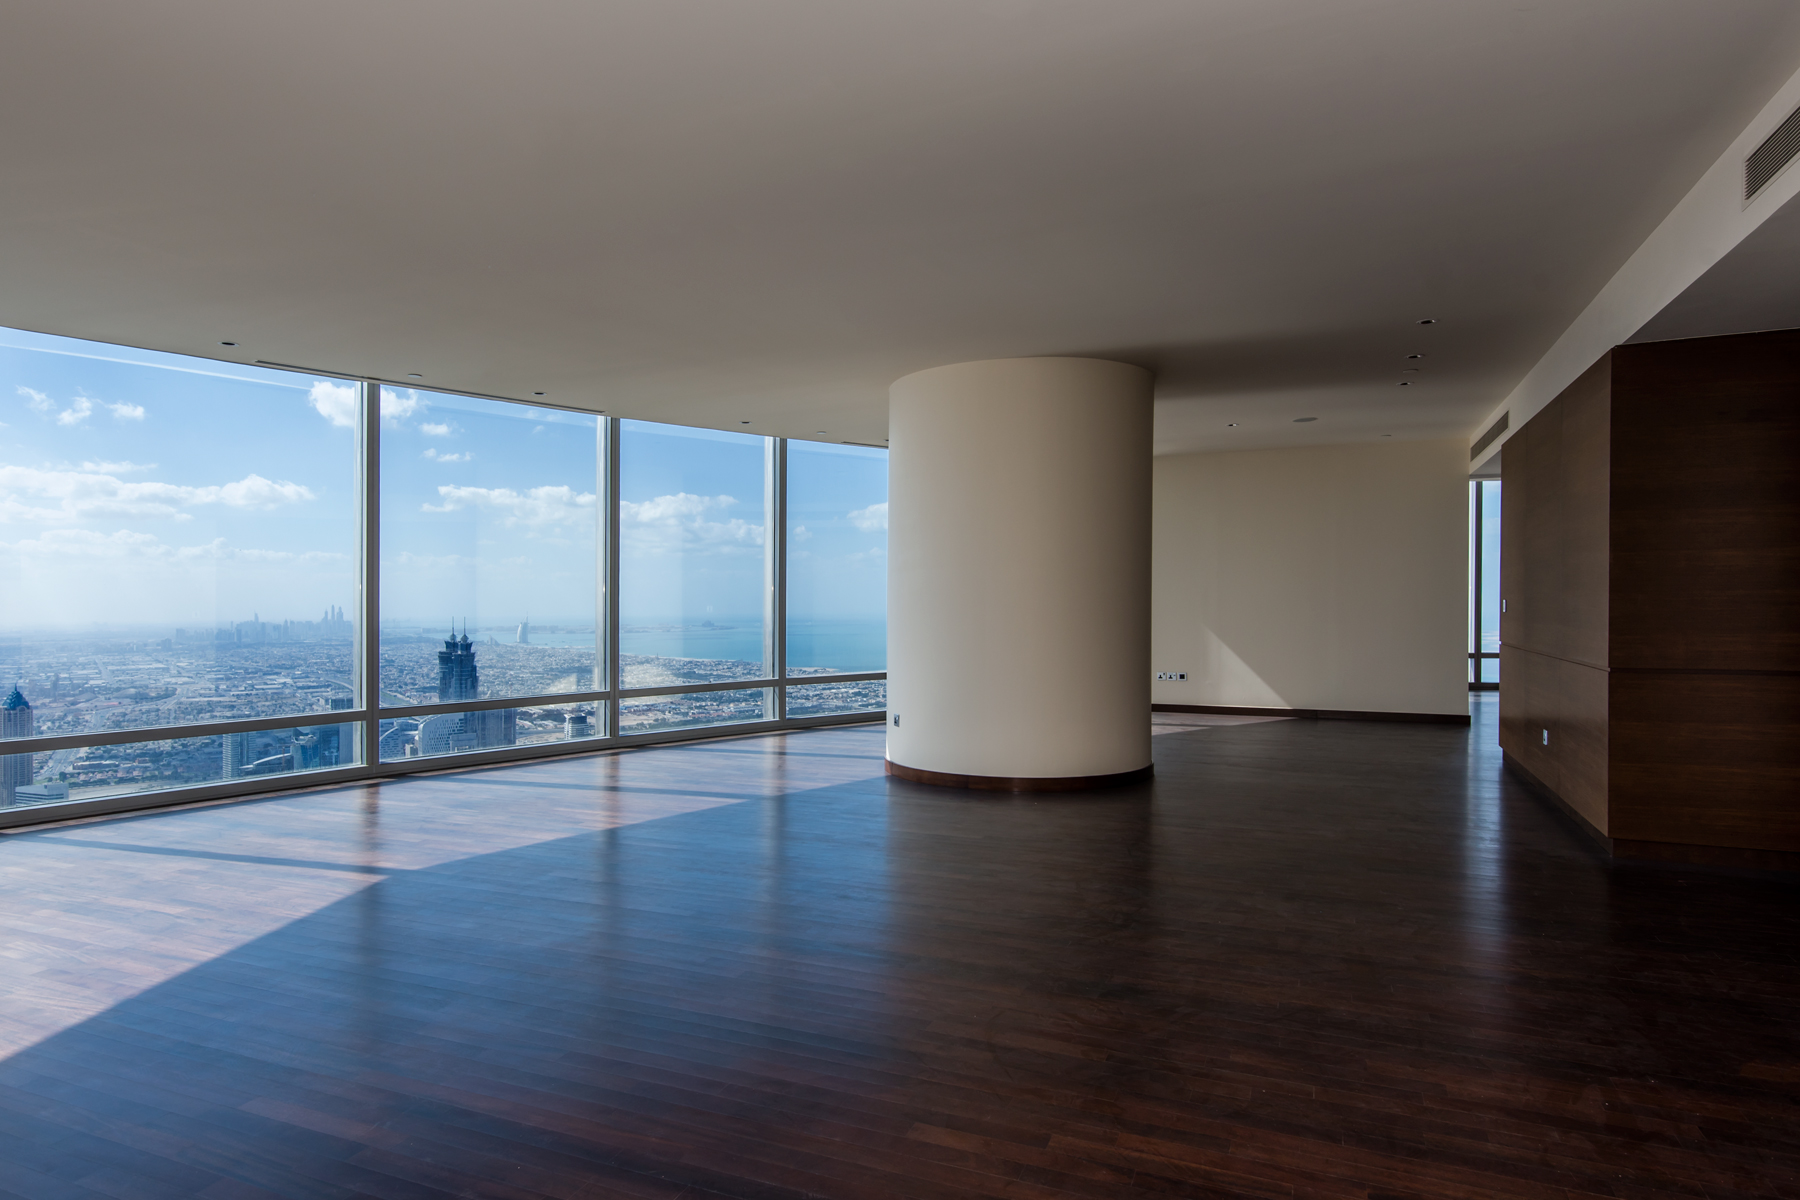 Apartment for Sale at Burj Khalifa Penthouse Dubai, United Arab Emirates